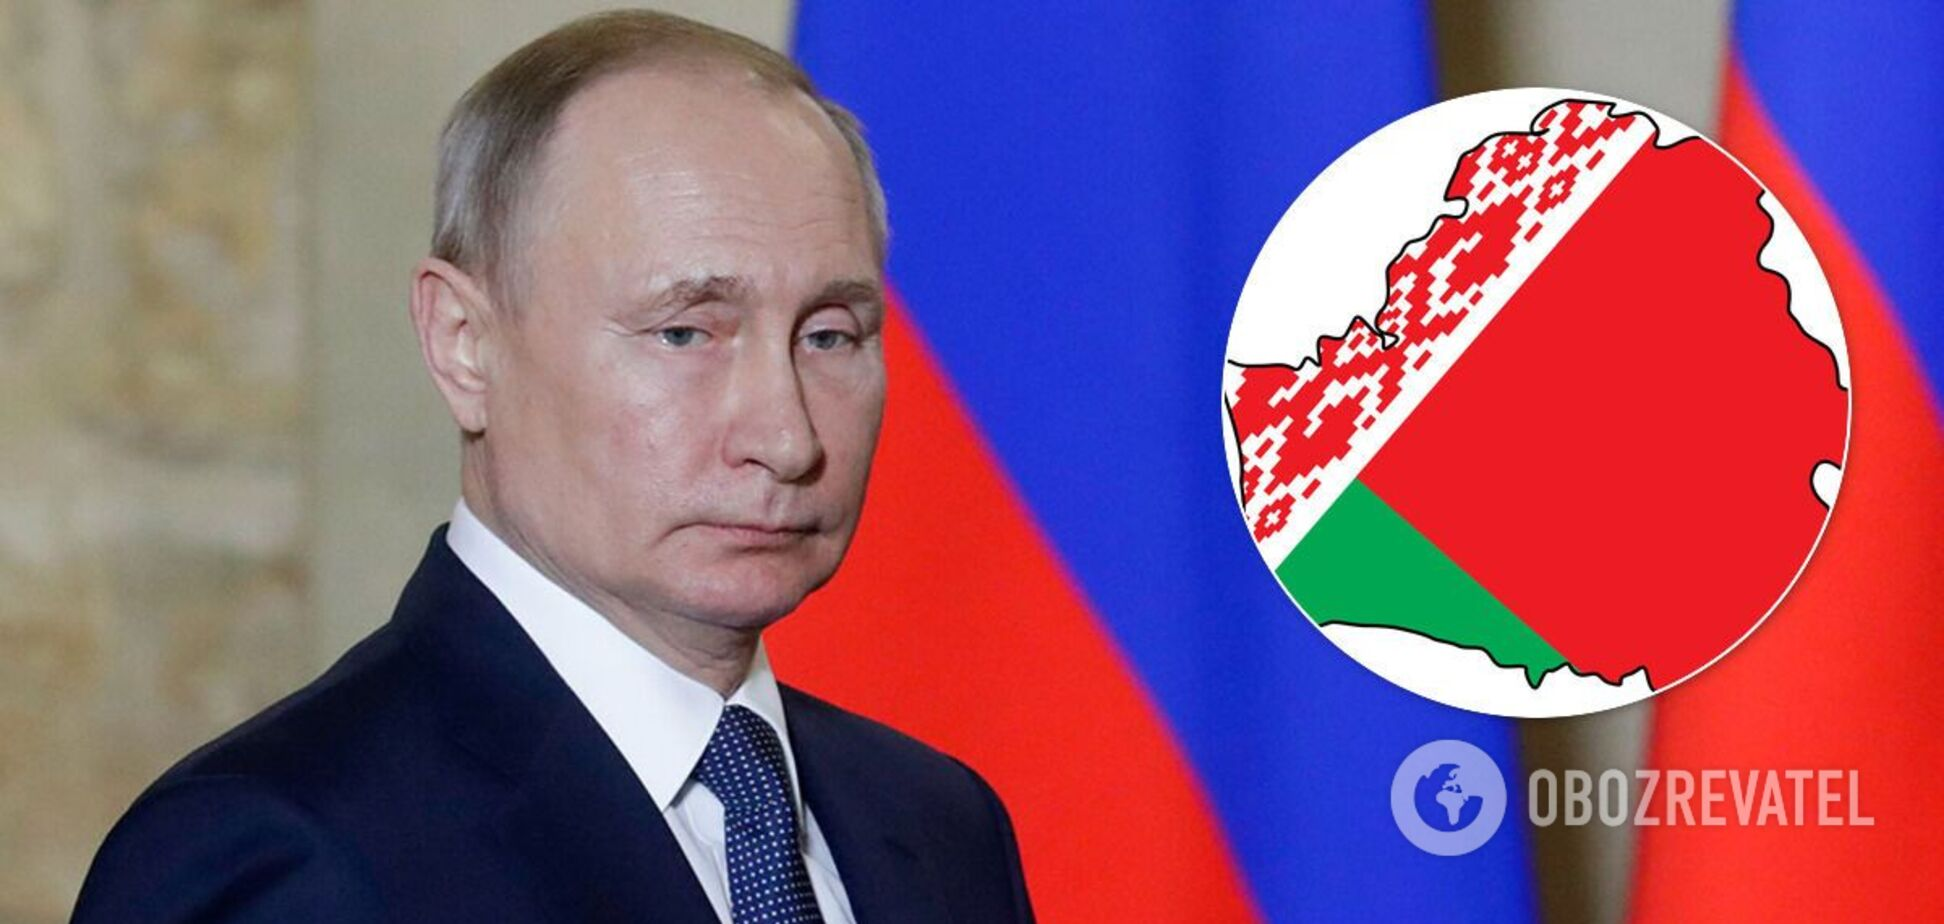 Путін не нападе на Україну, йому потрібна Білорусь, – Пономарьов